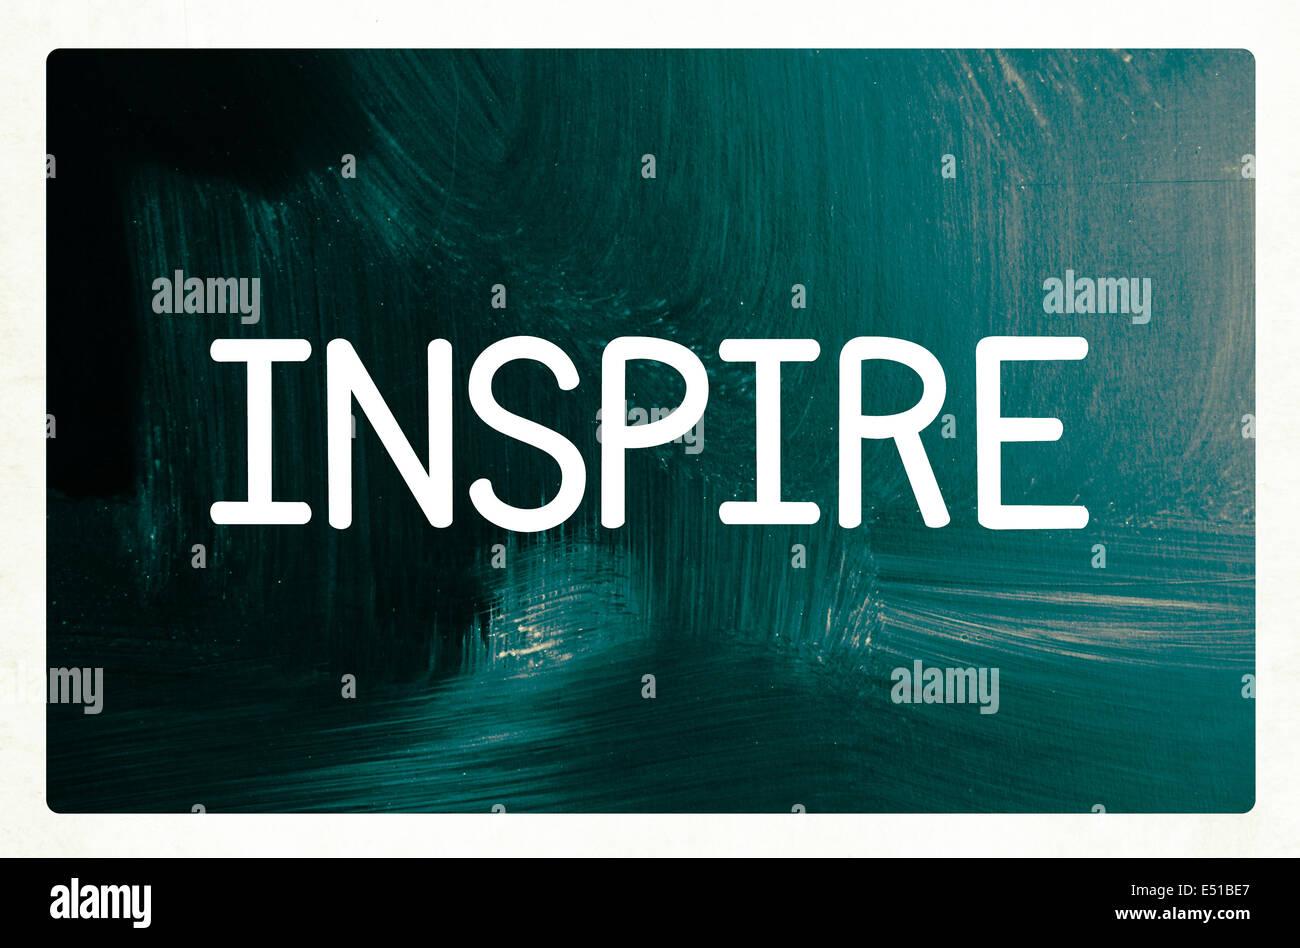 inspire concept - Stock Image